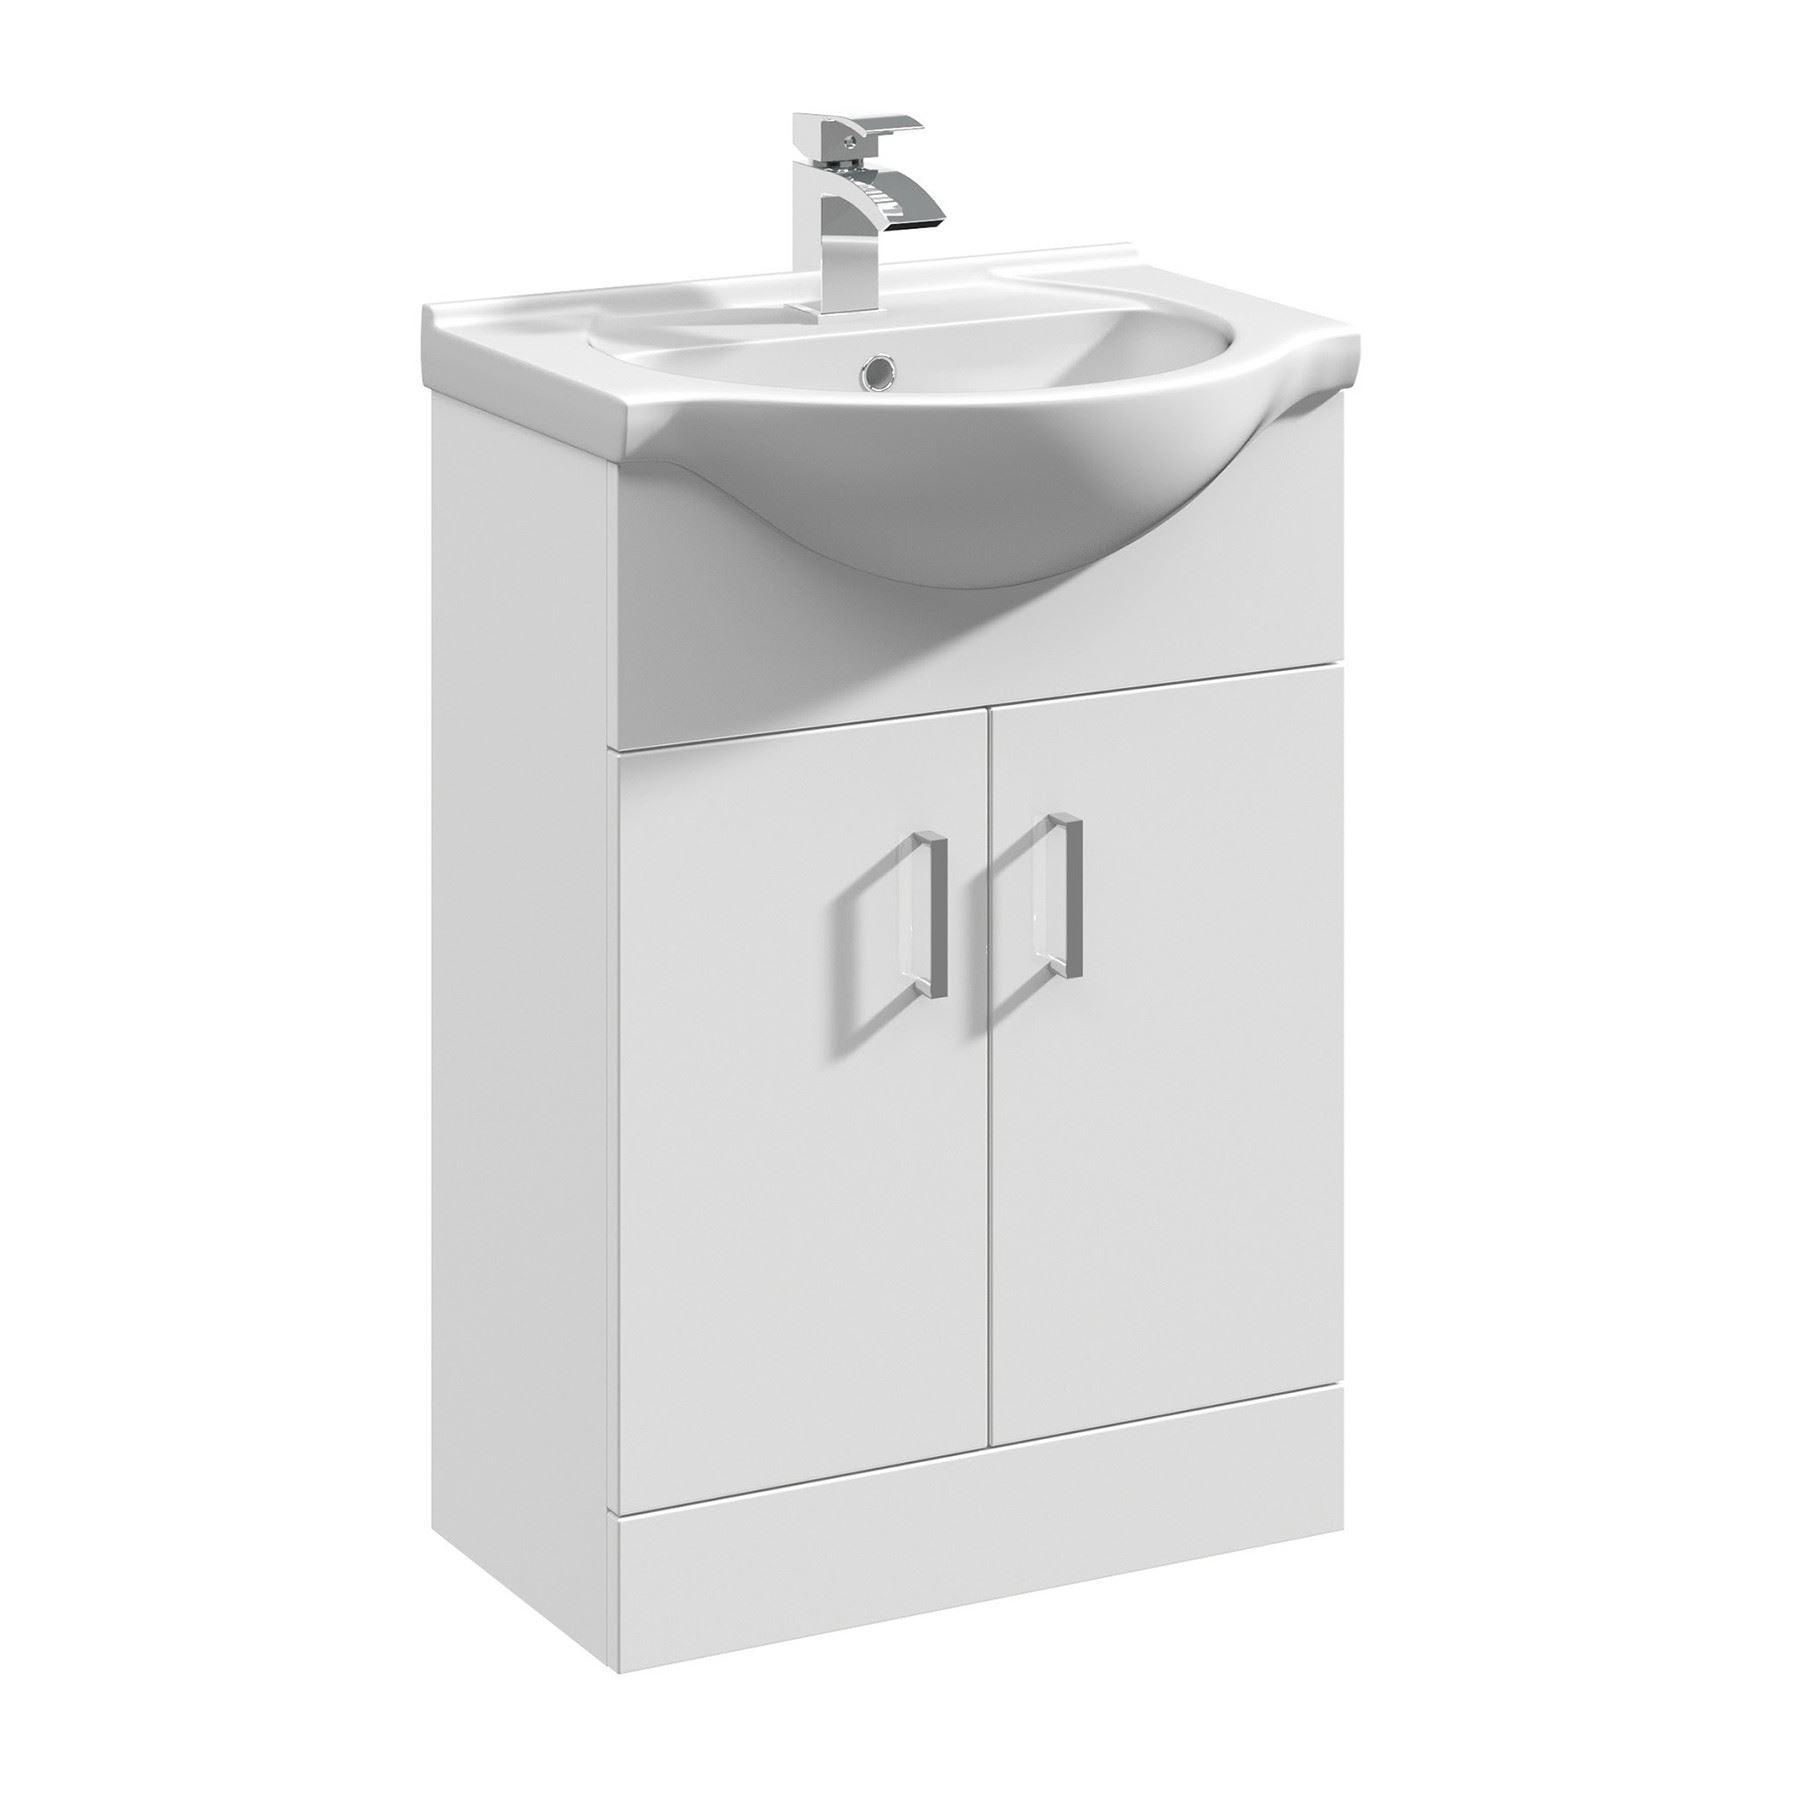 Gloss white bathroom vanity unit cloakroom cabinet - White gloss bathroom vanity unit ...